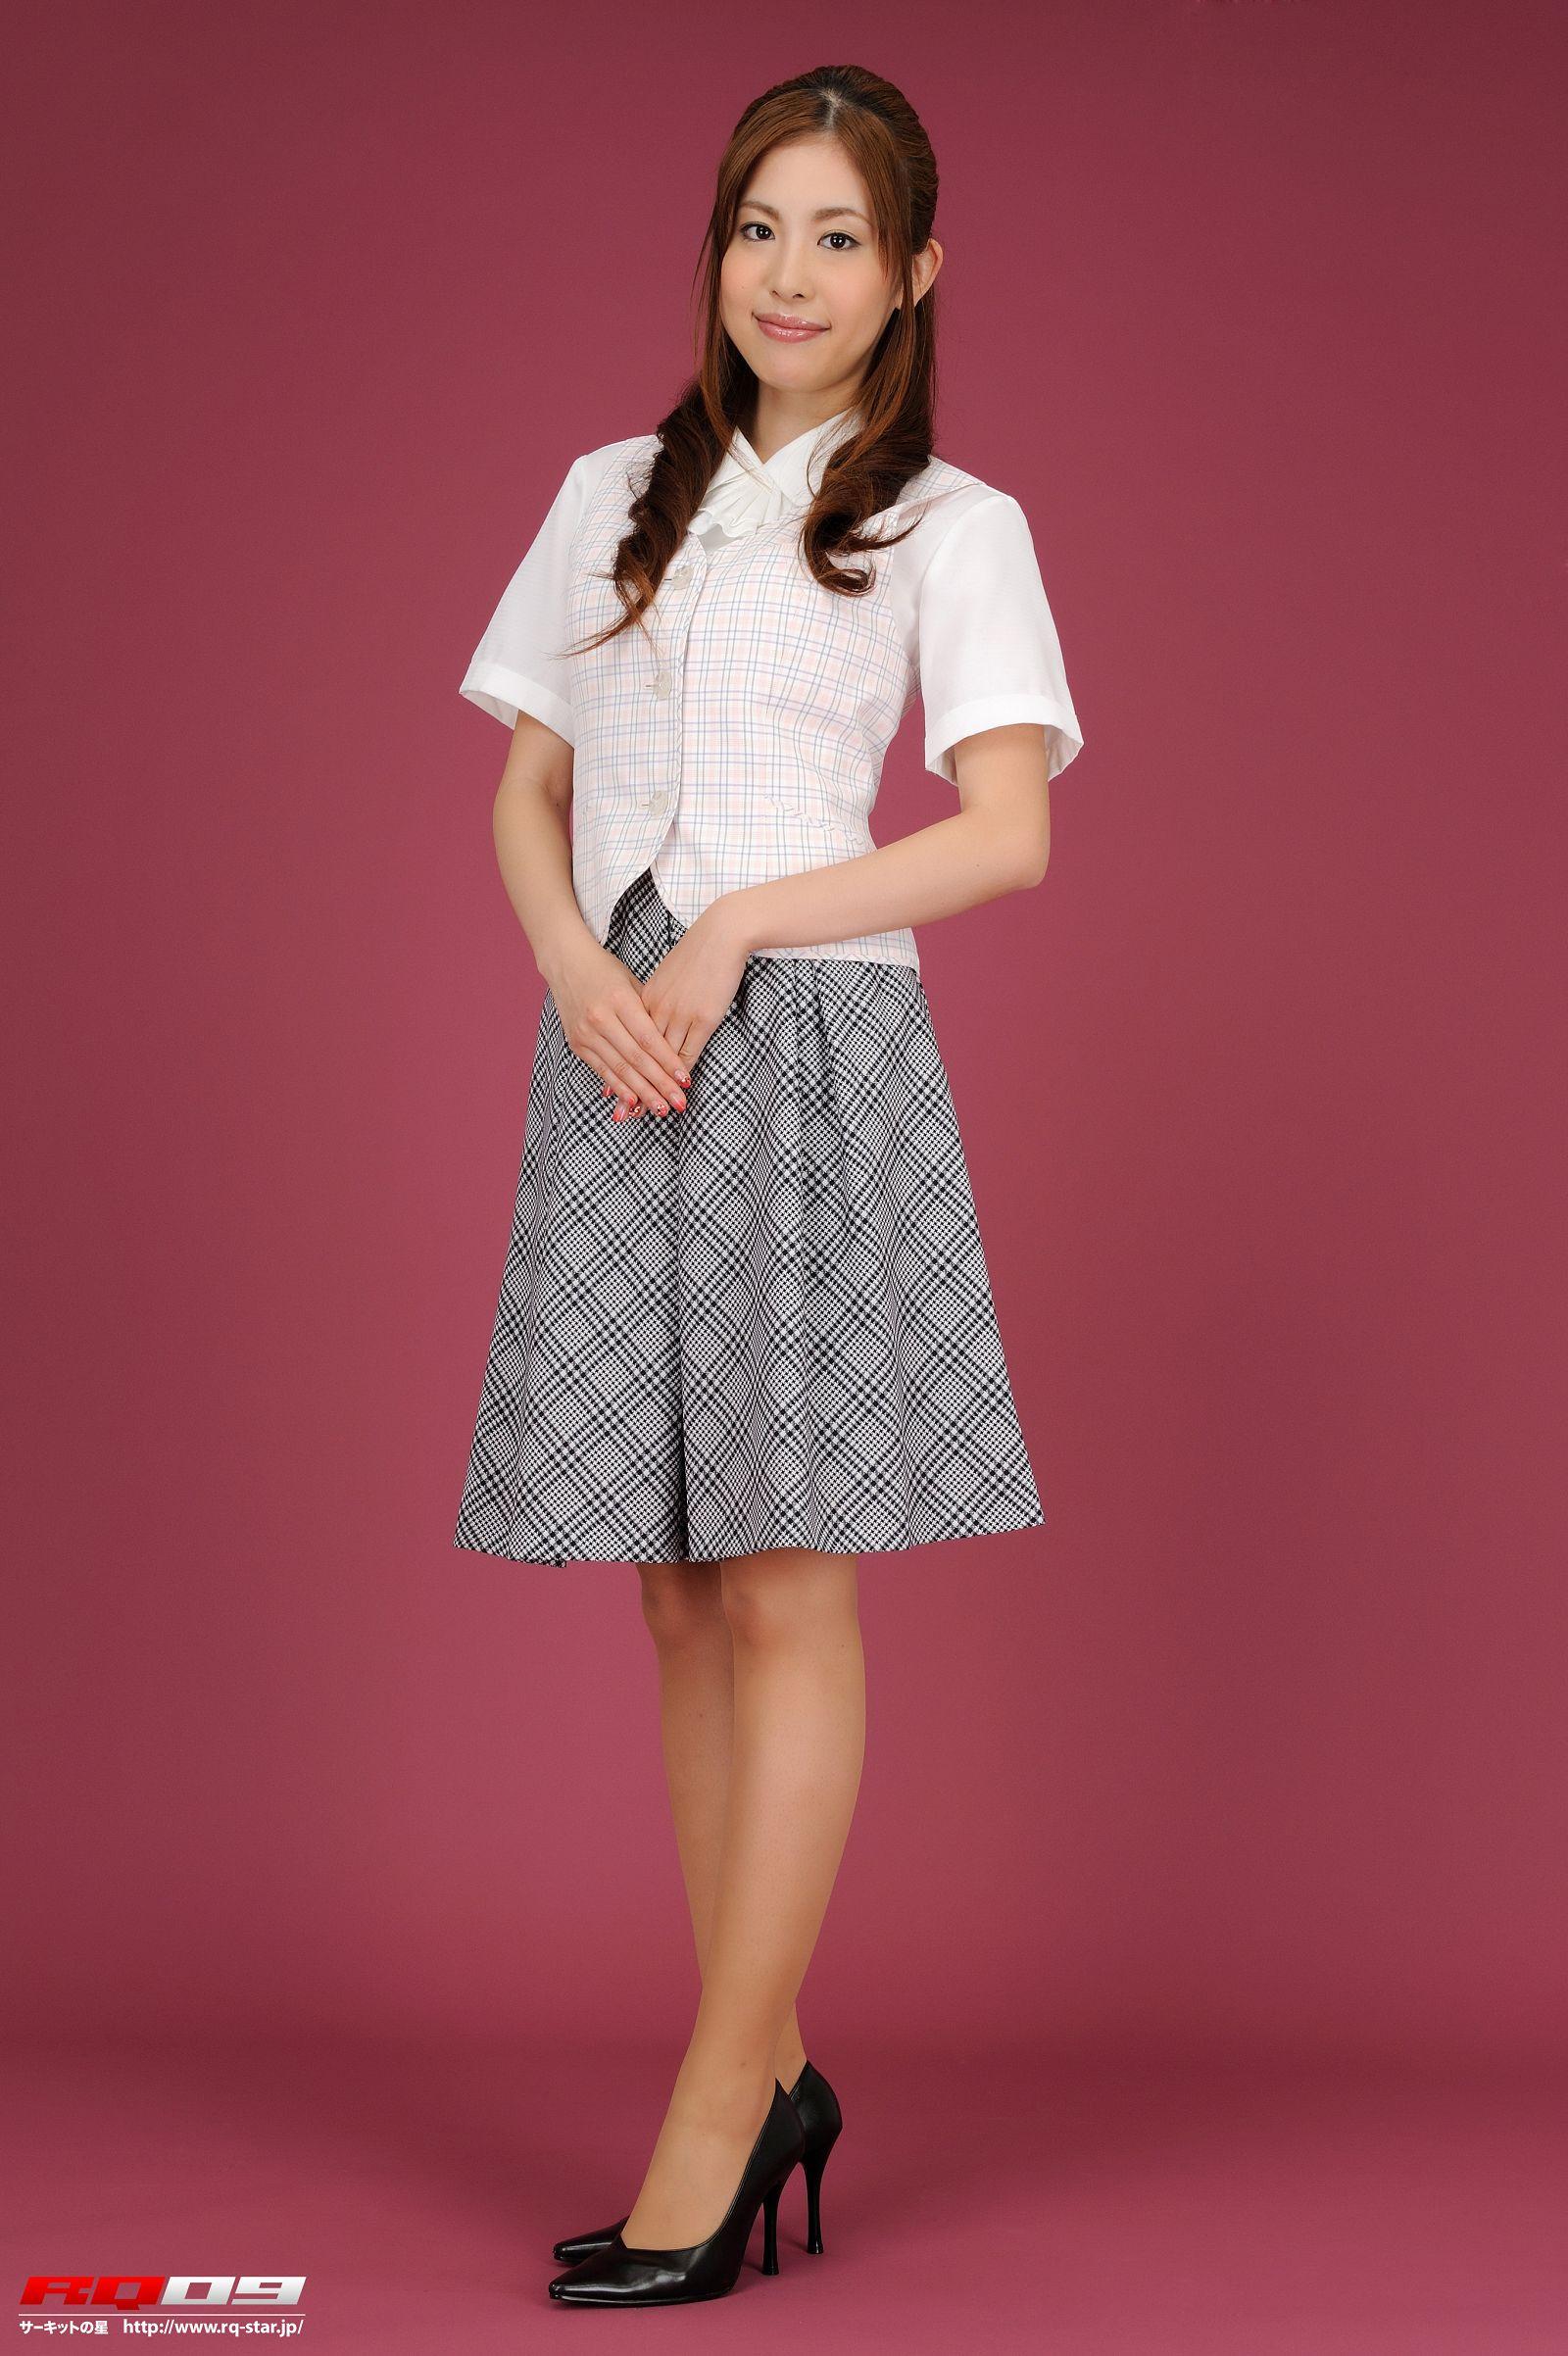 [RQ STAR美女] NO.0160 Sayuri Kouda 幸田さゆり Office Lady[130P] RQ STAR 第1张